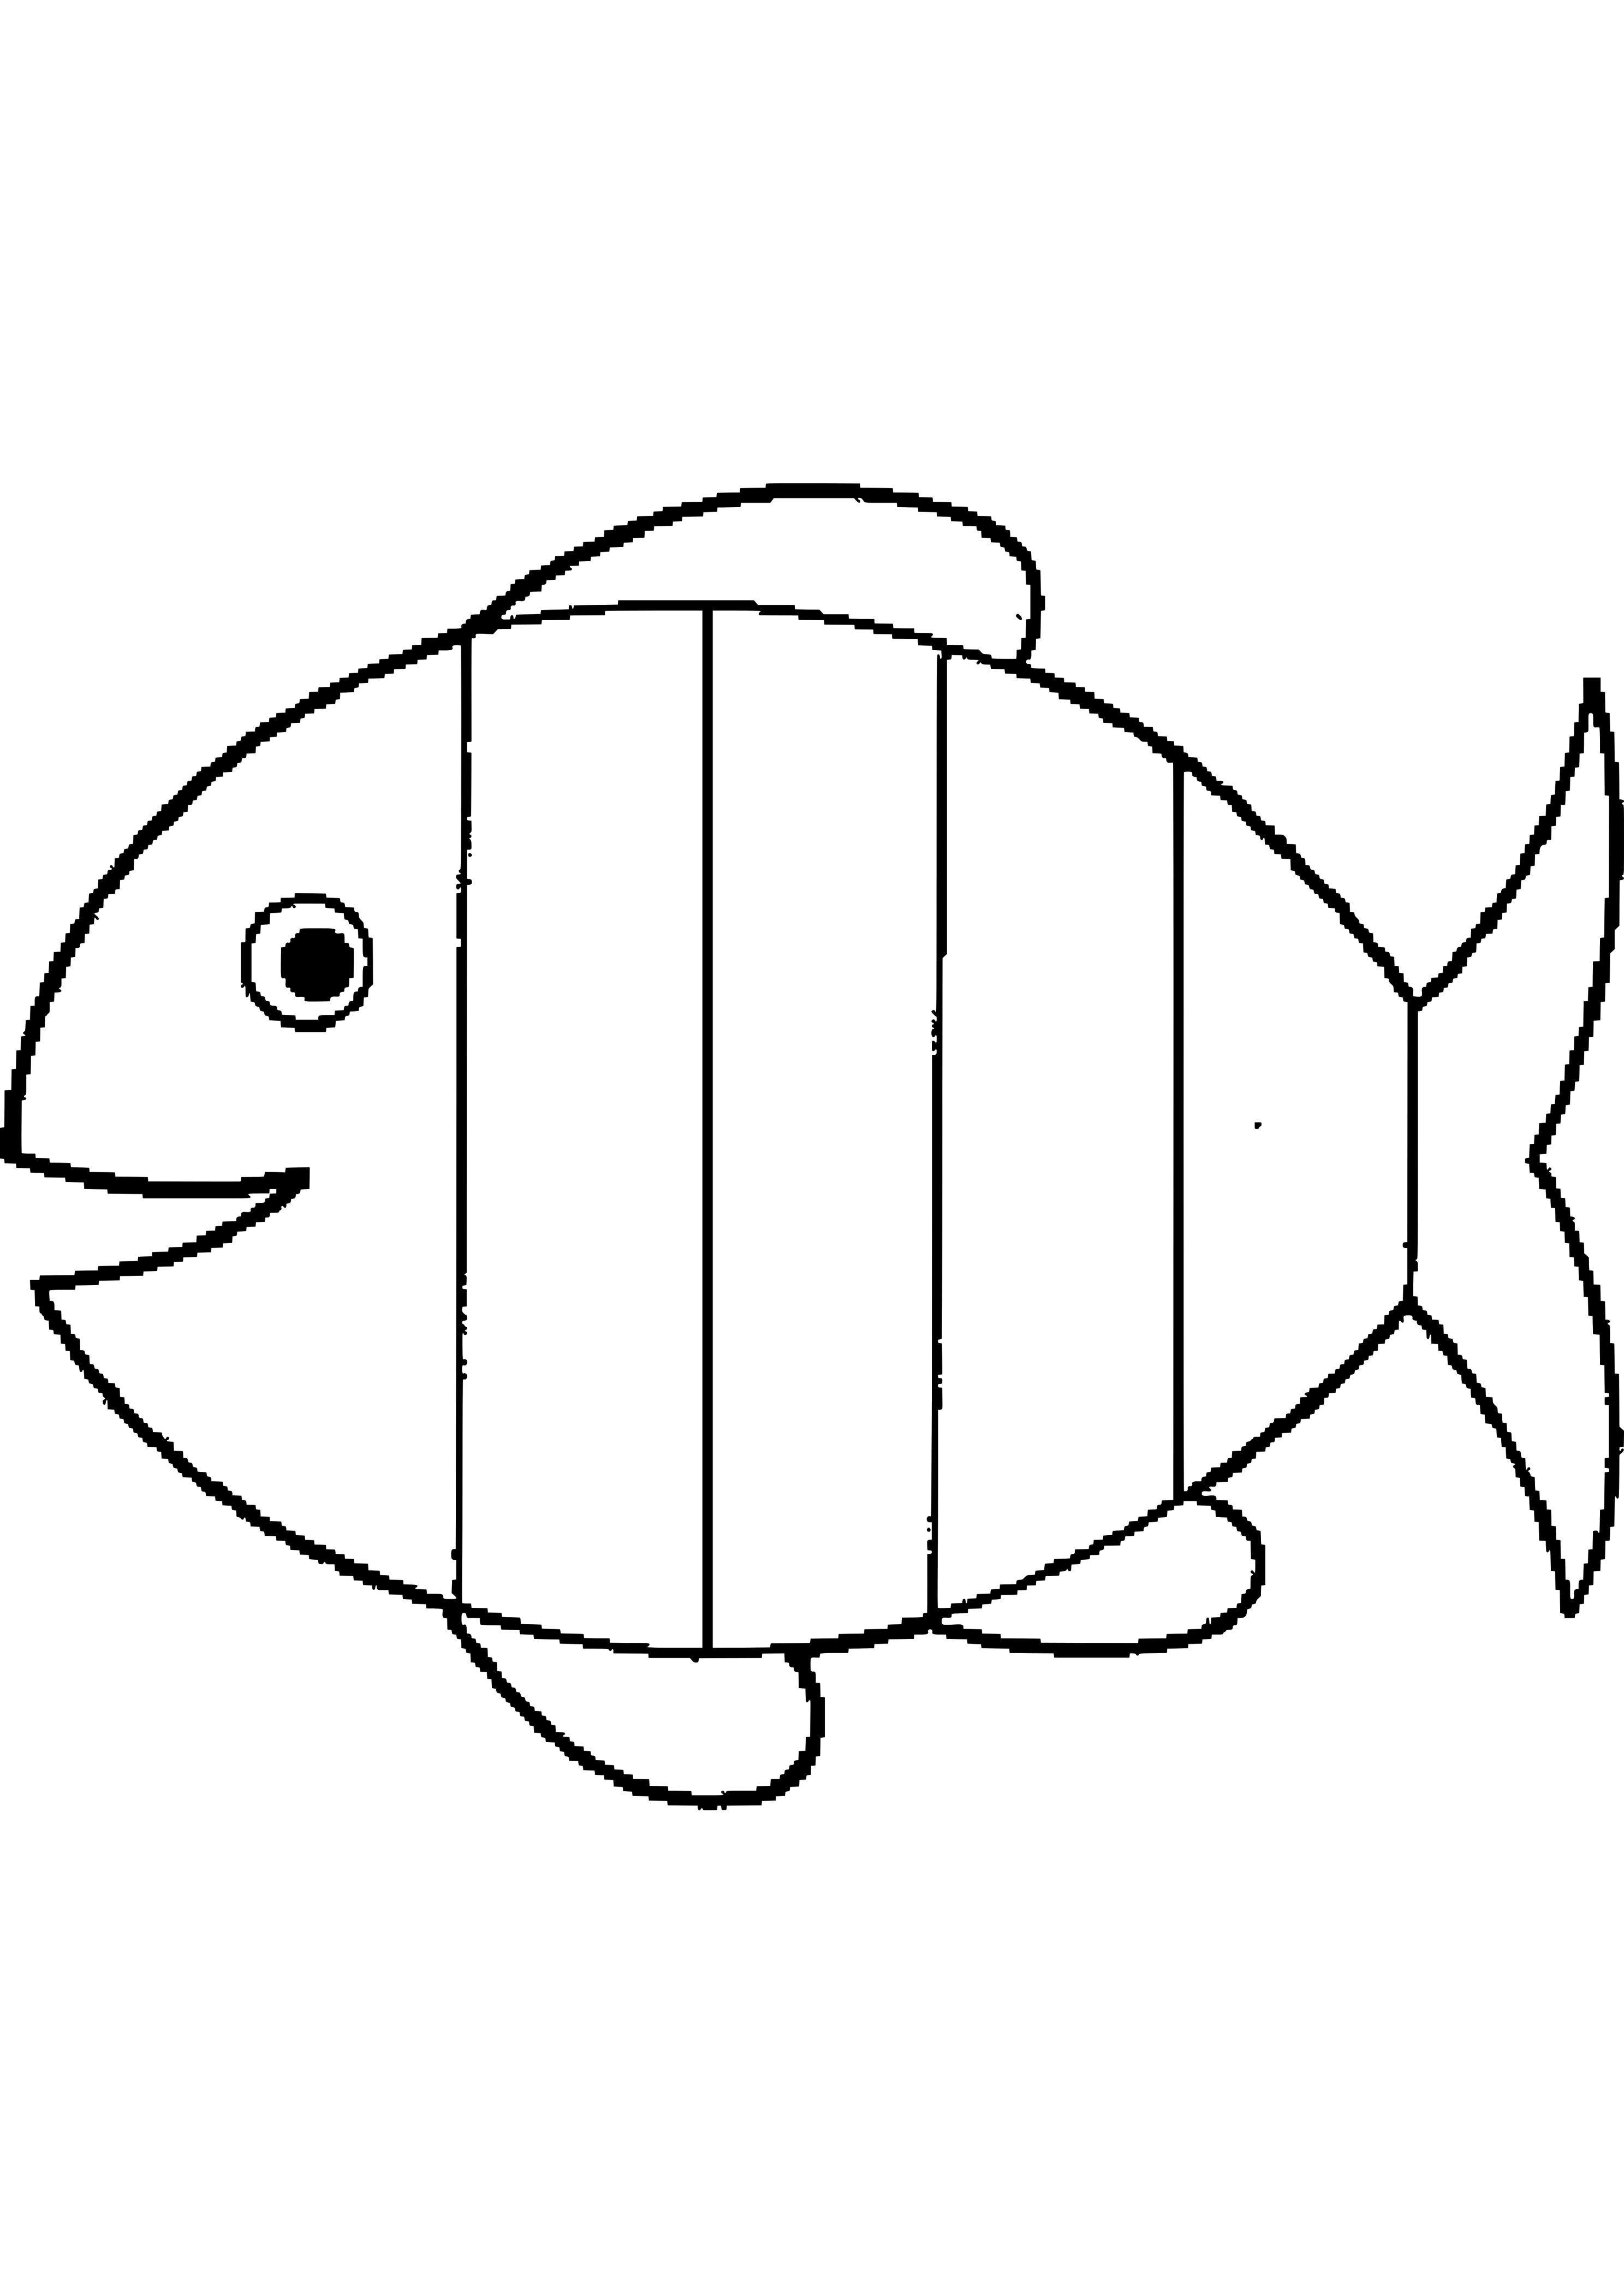 Dibujos De Pescados Para Tatuar 1 2975x4200 4207 Png 2975 4200 Molde De Pez Plantilla De Pez Pez Para Colorear